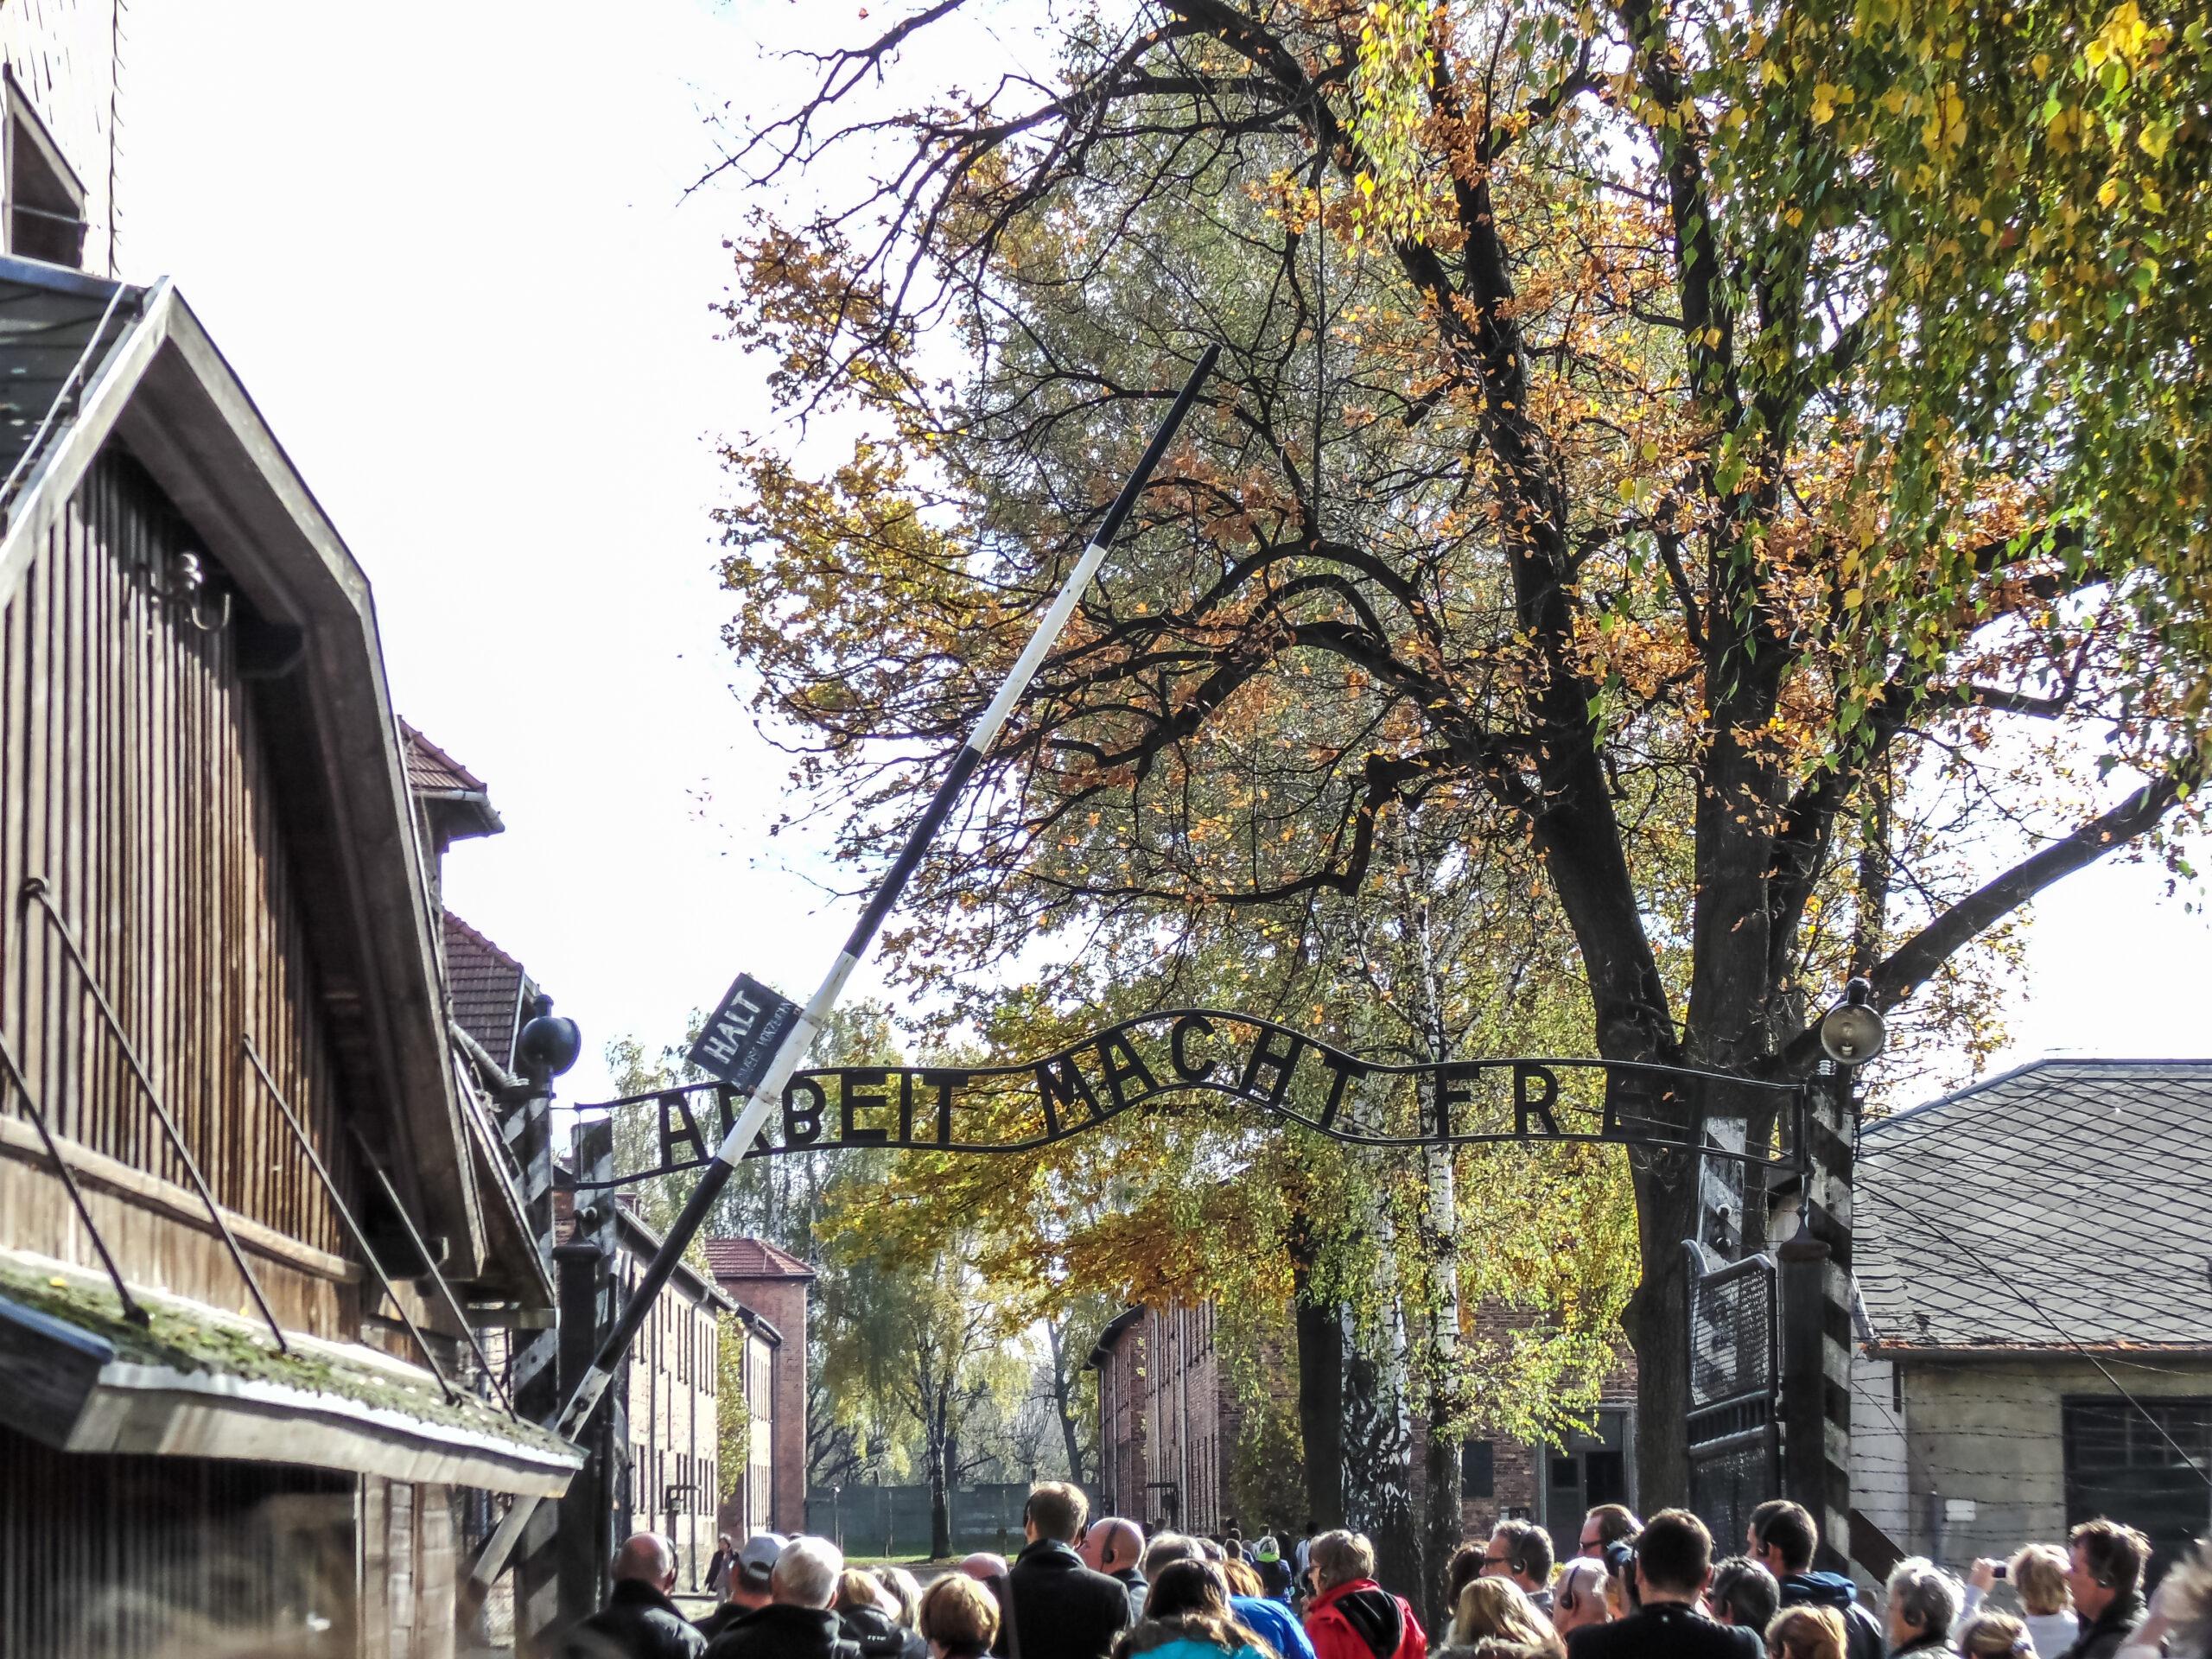 Auschwitz entrance gate with tourists; Courtesy Thomas Ortega/Shutterstock